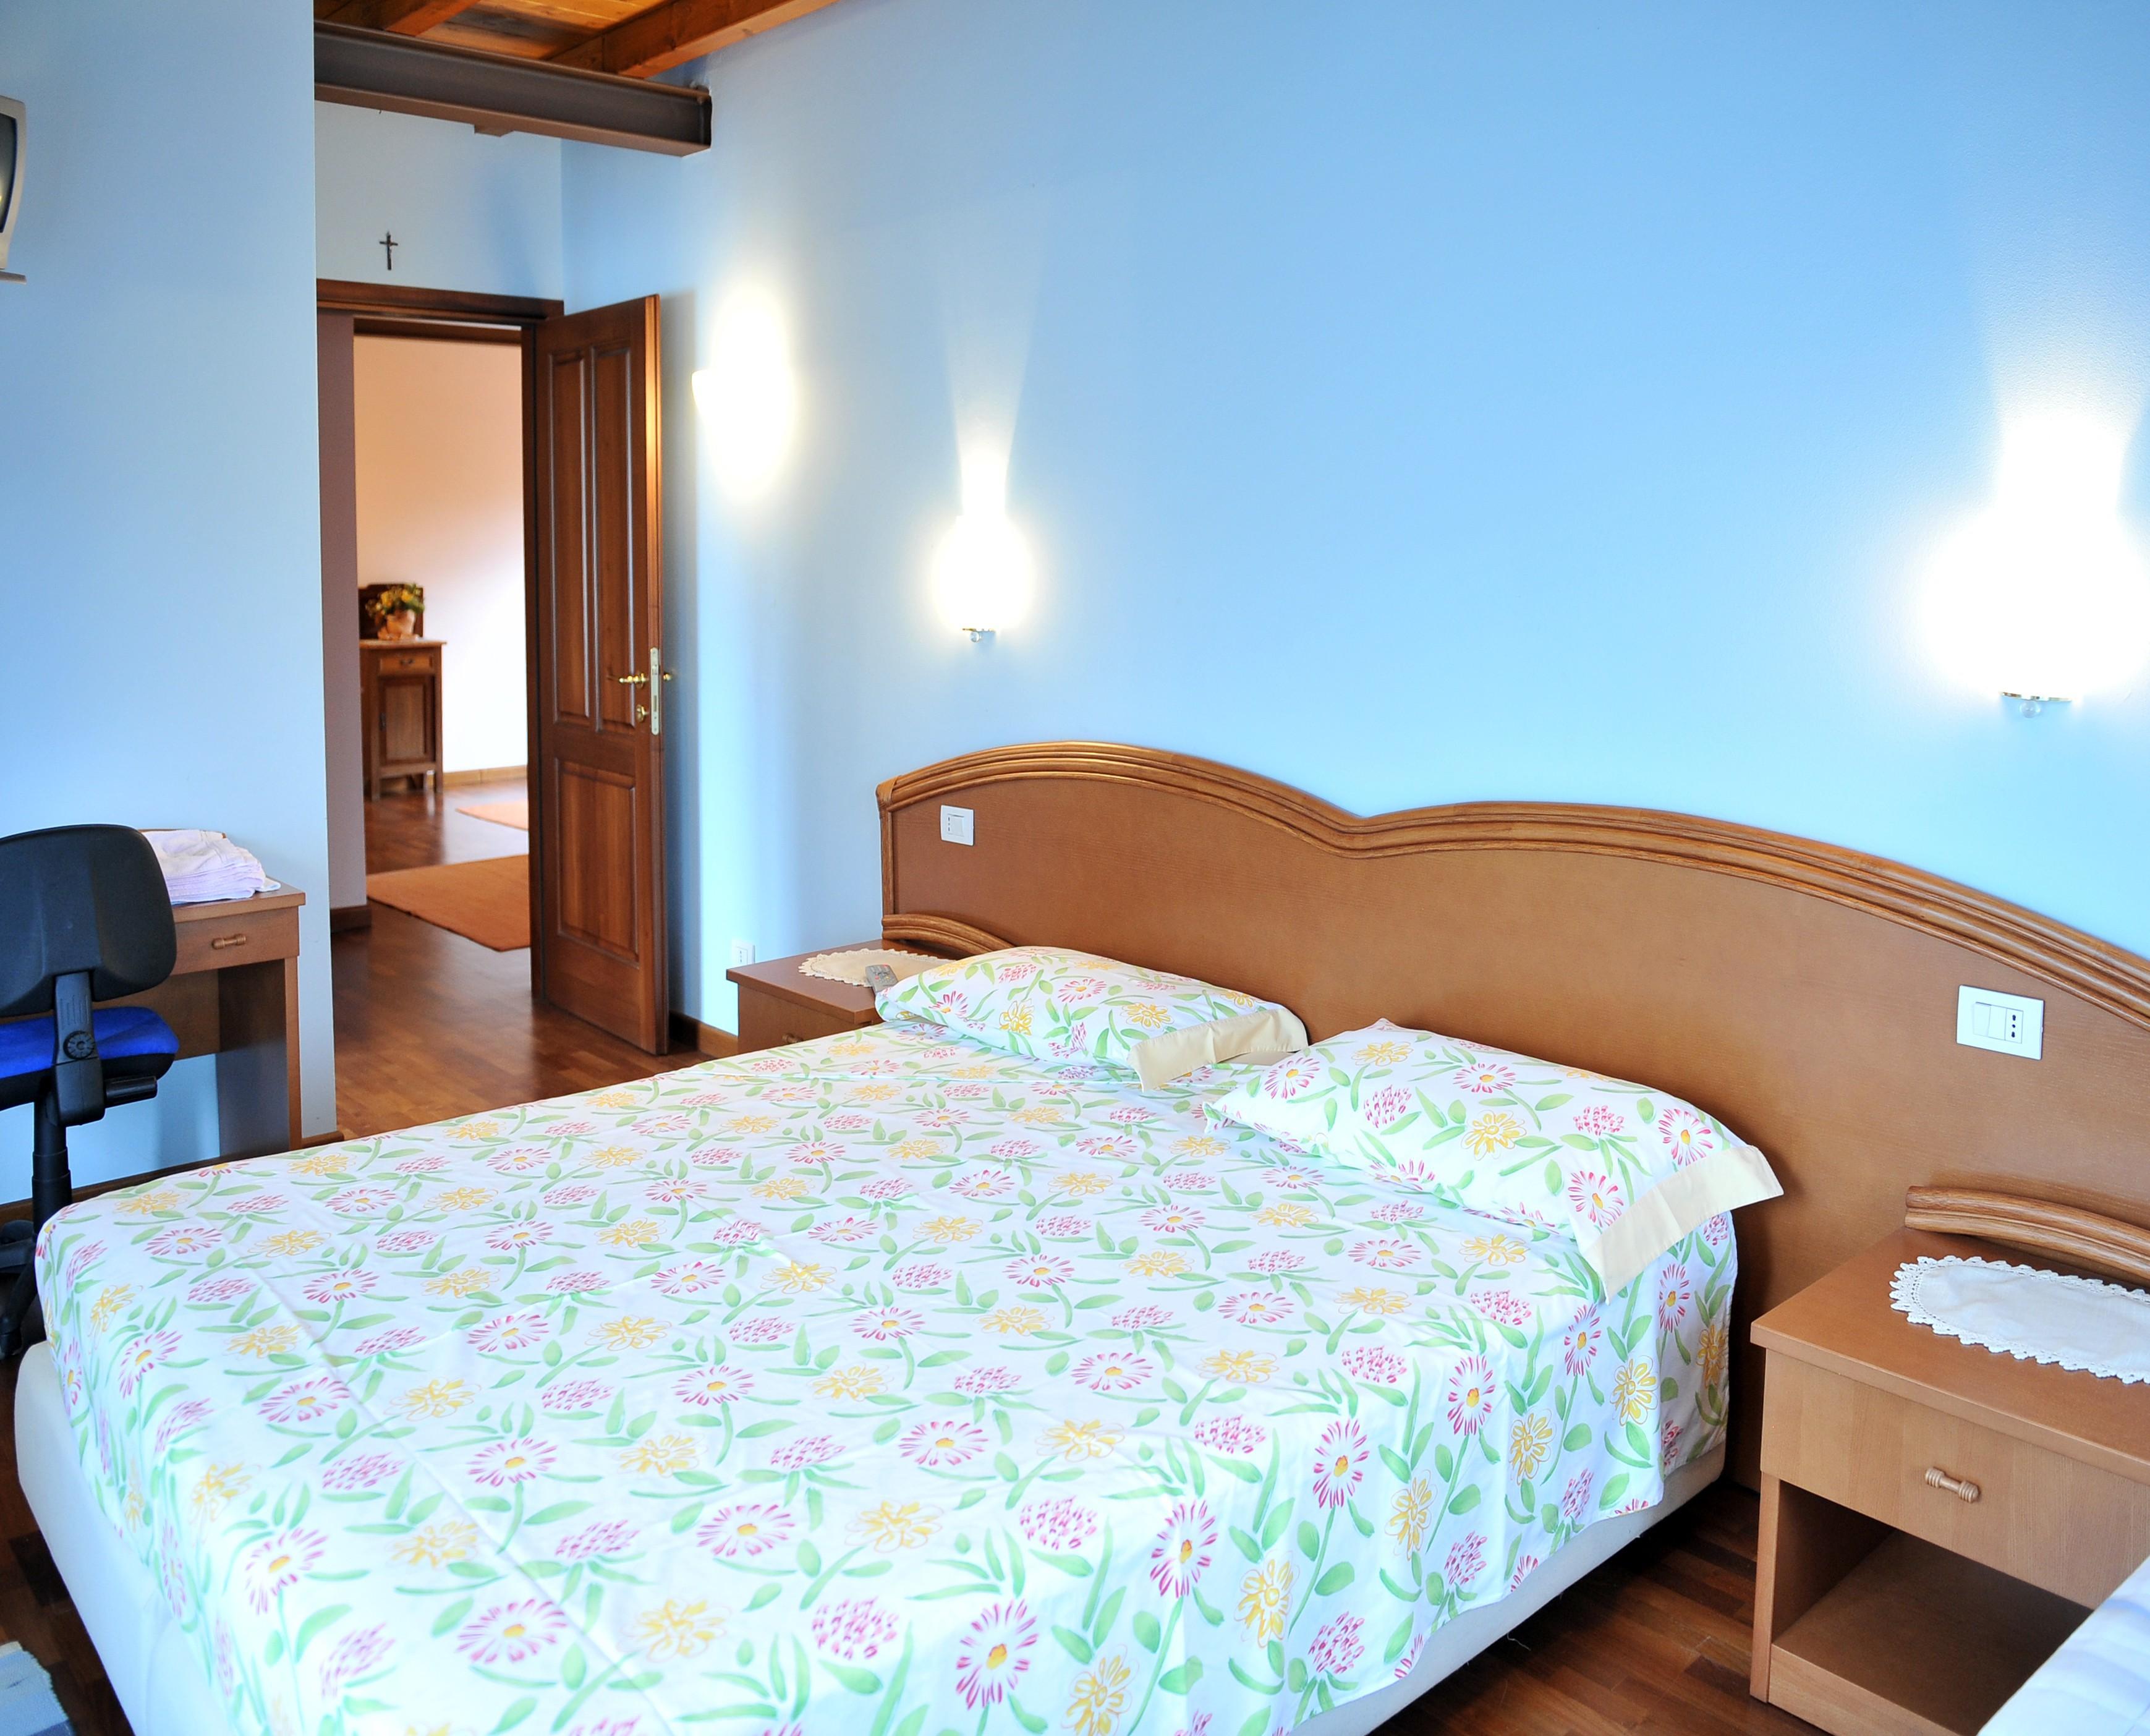 The light blue room